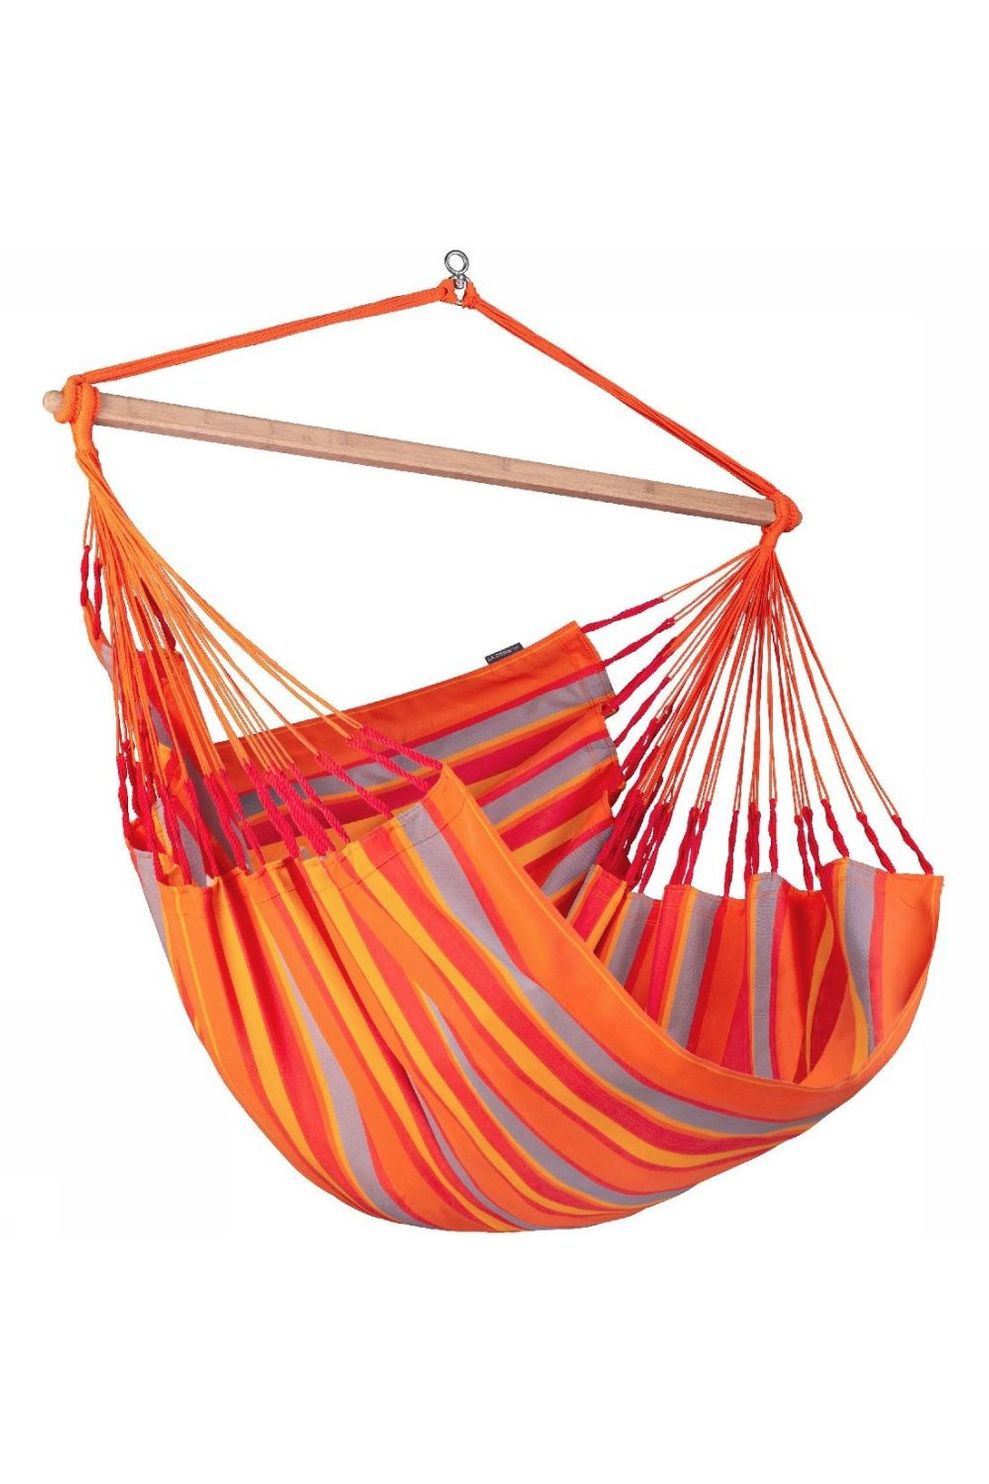 La Siesta Hangmat Domingo Lounger Chair - Rood/Oranje